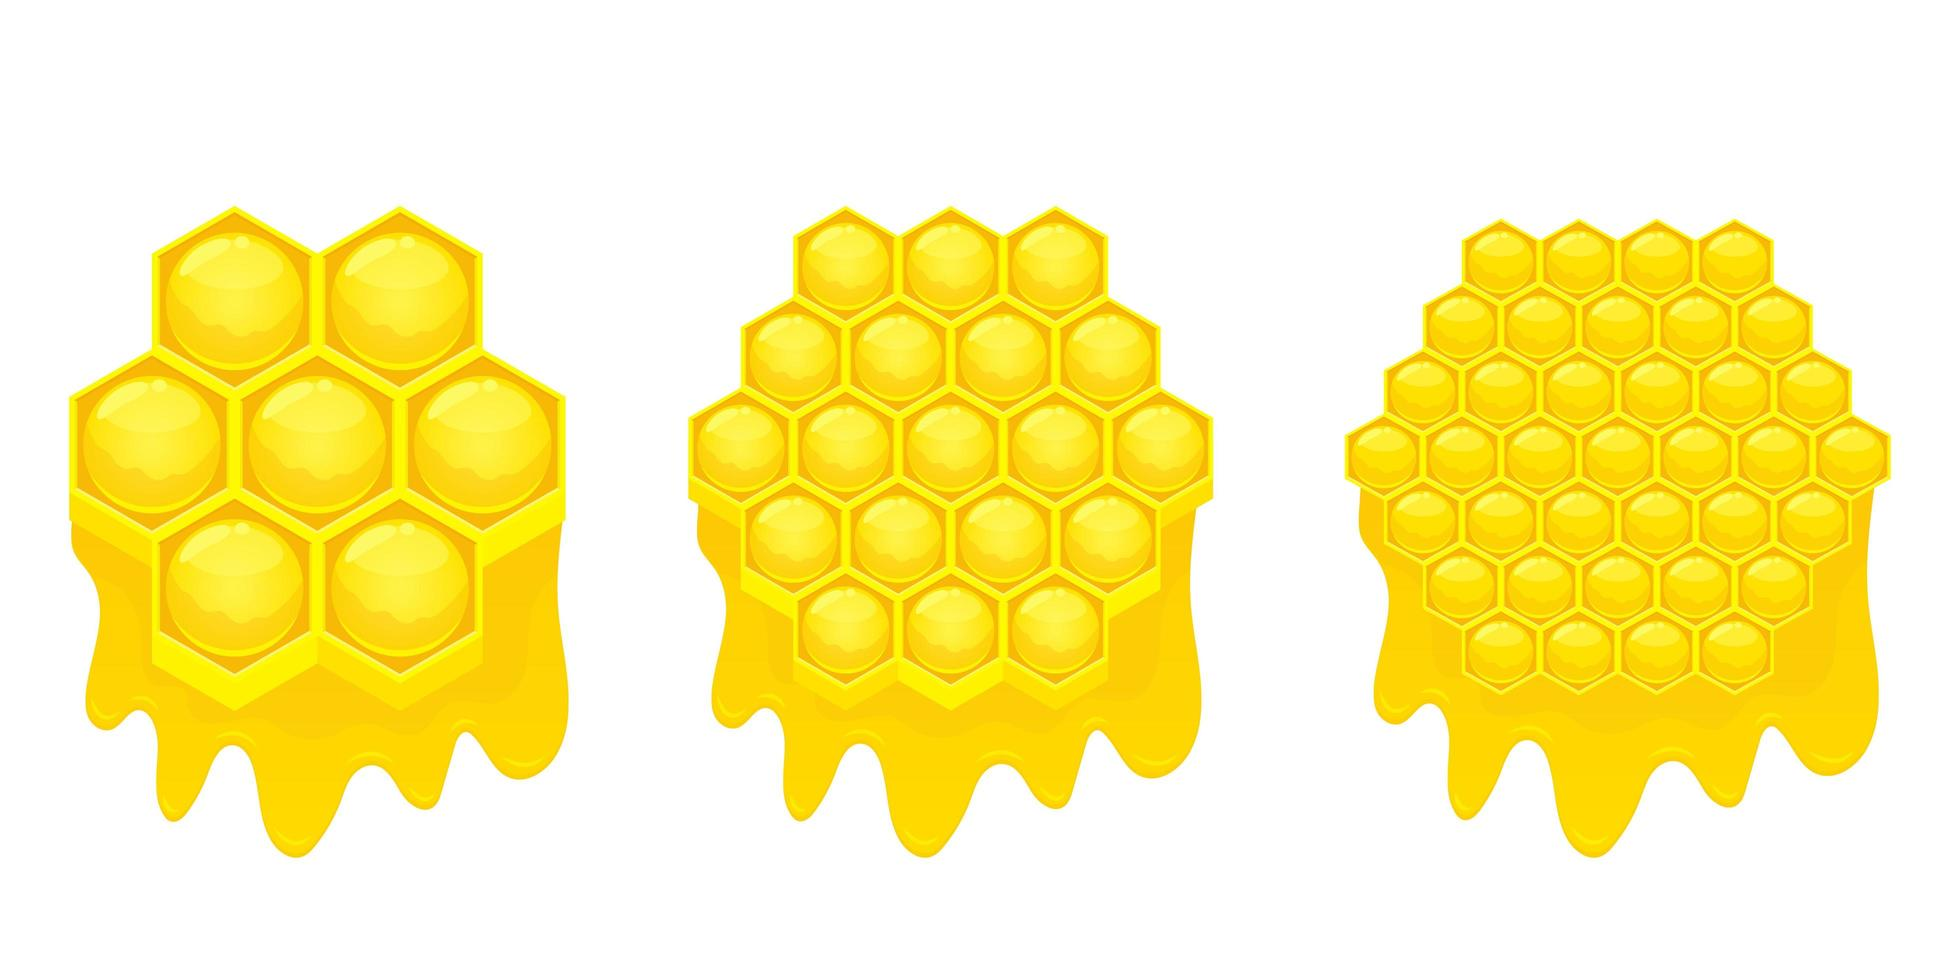 Honeycomb vector design illustration isolated on white background